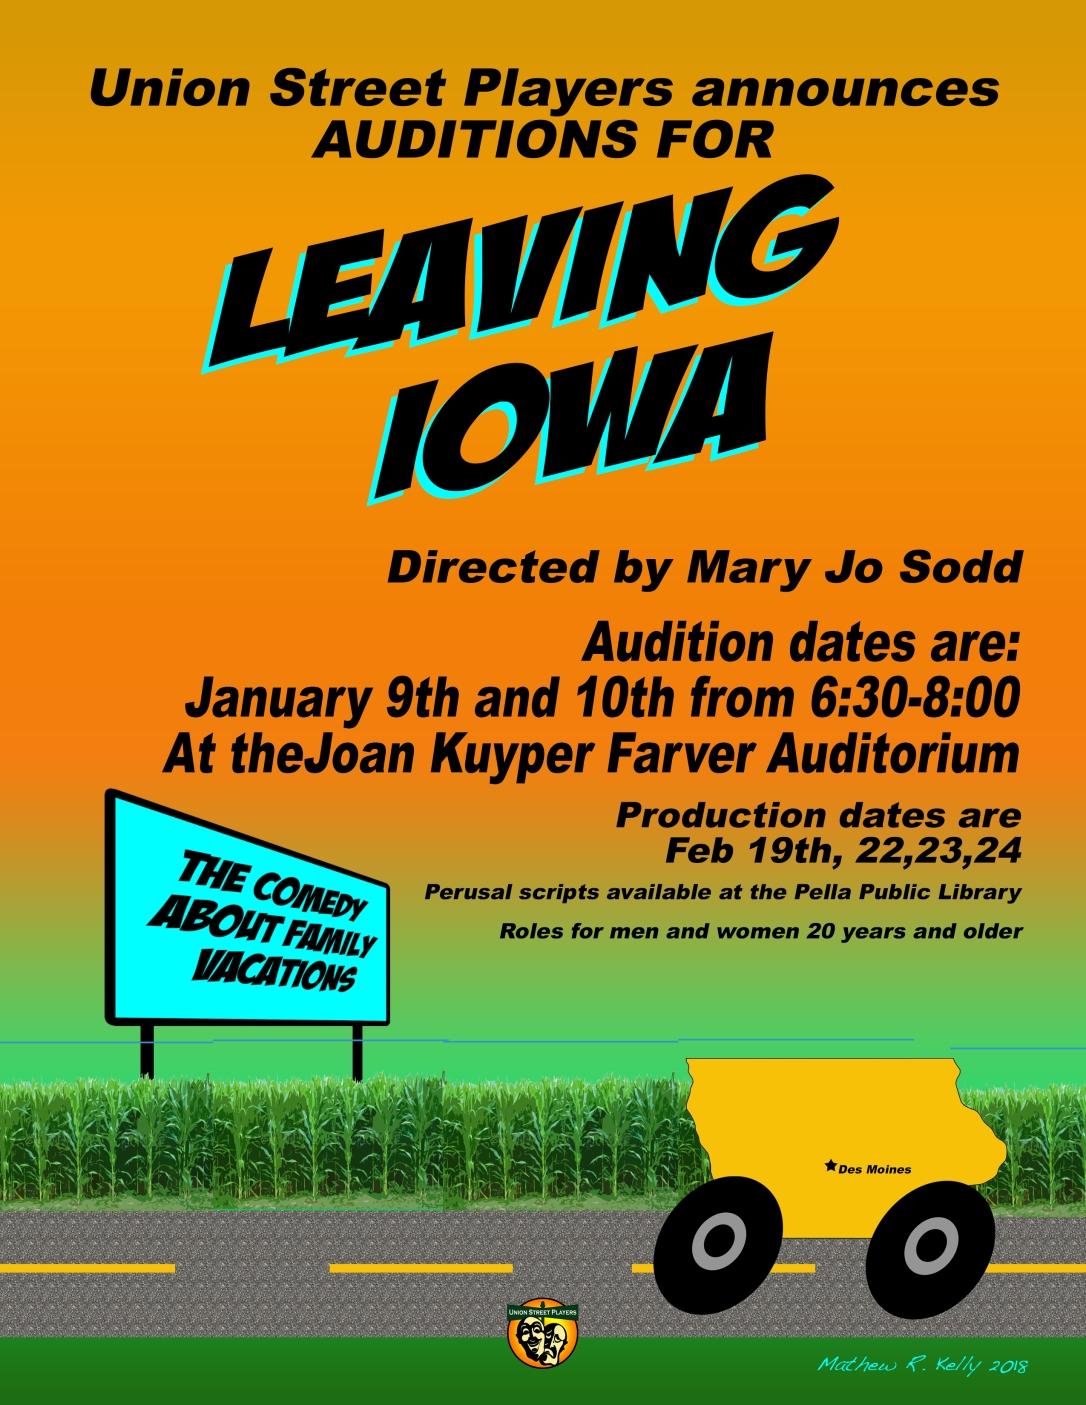 Leaving Iowa AUD